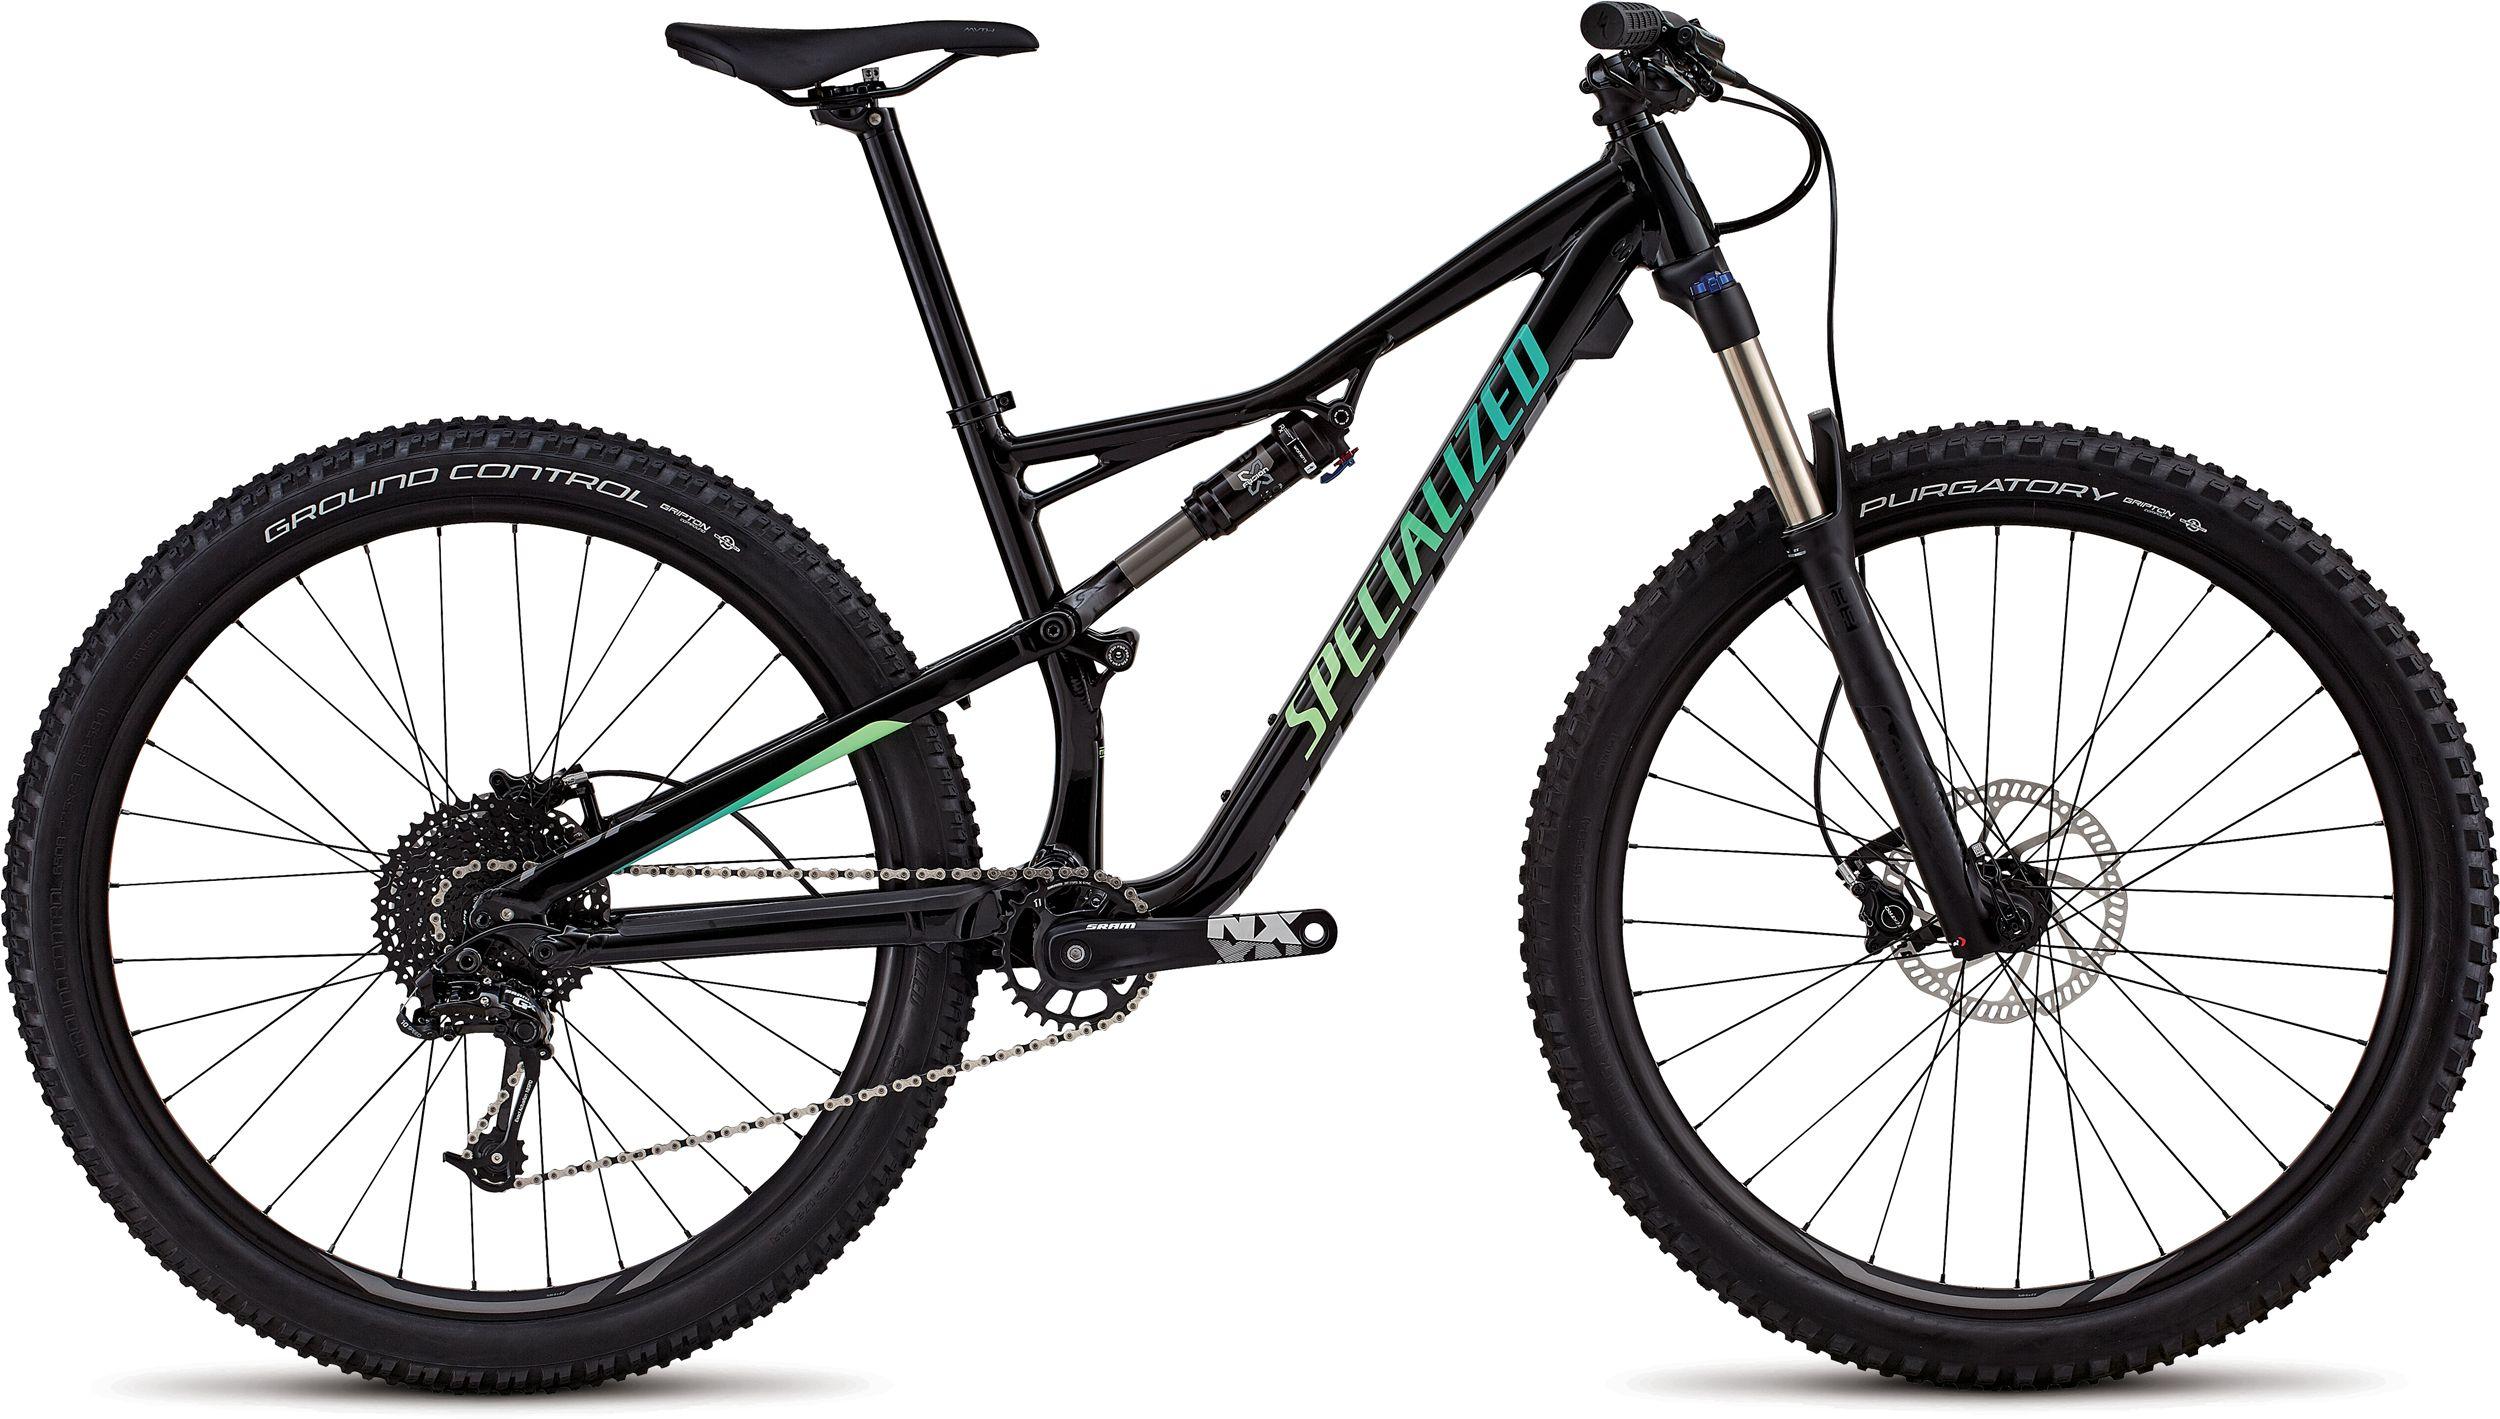 Specialized Camber 650b Womens Mountain Bike